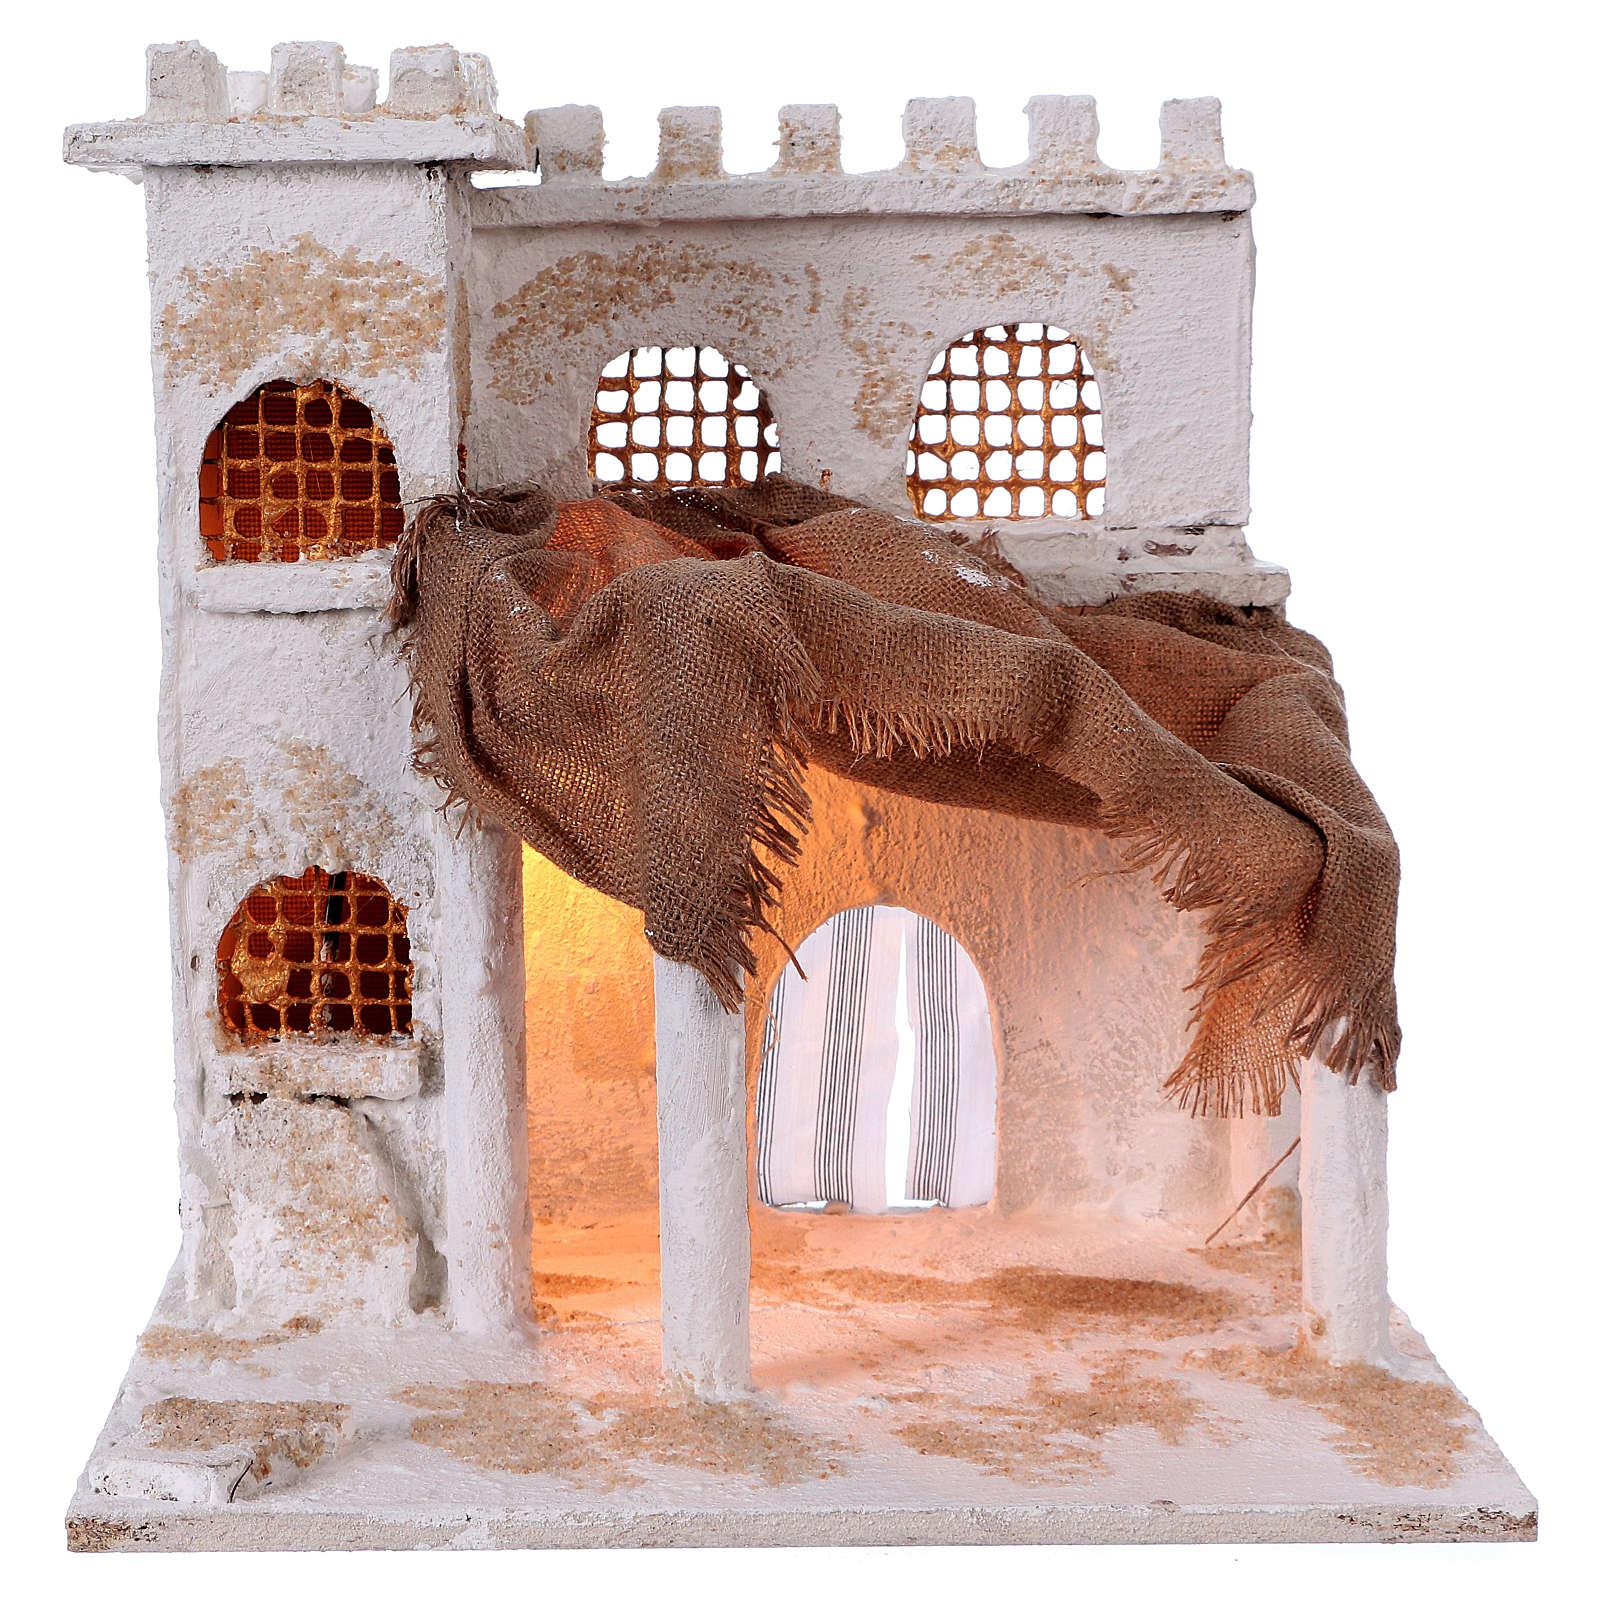 Arabian style house with pillars for Nativity scene 37x35x30 cm 4